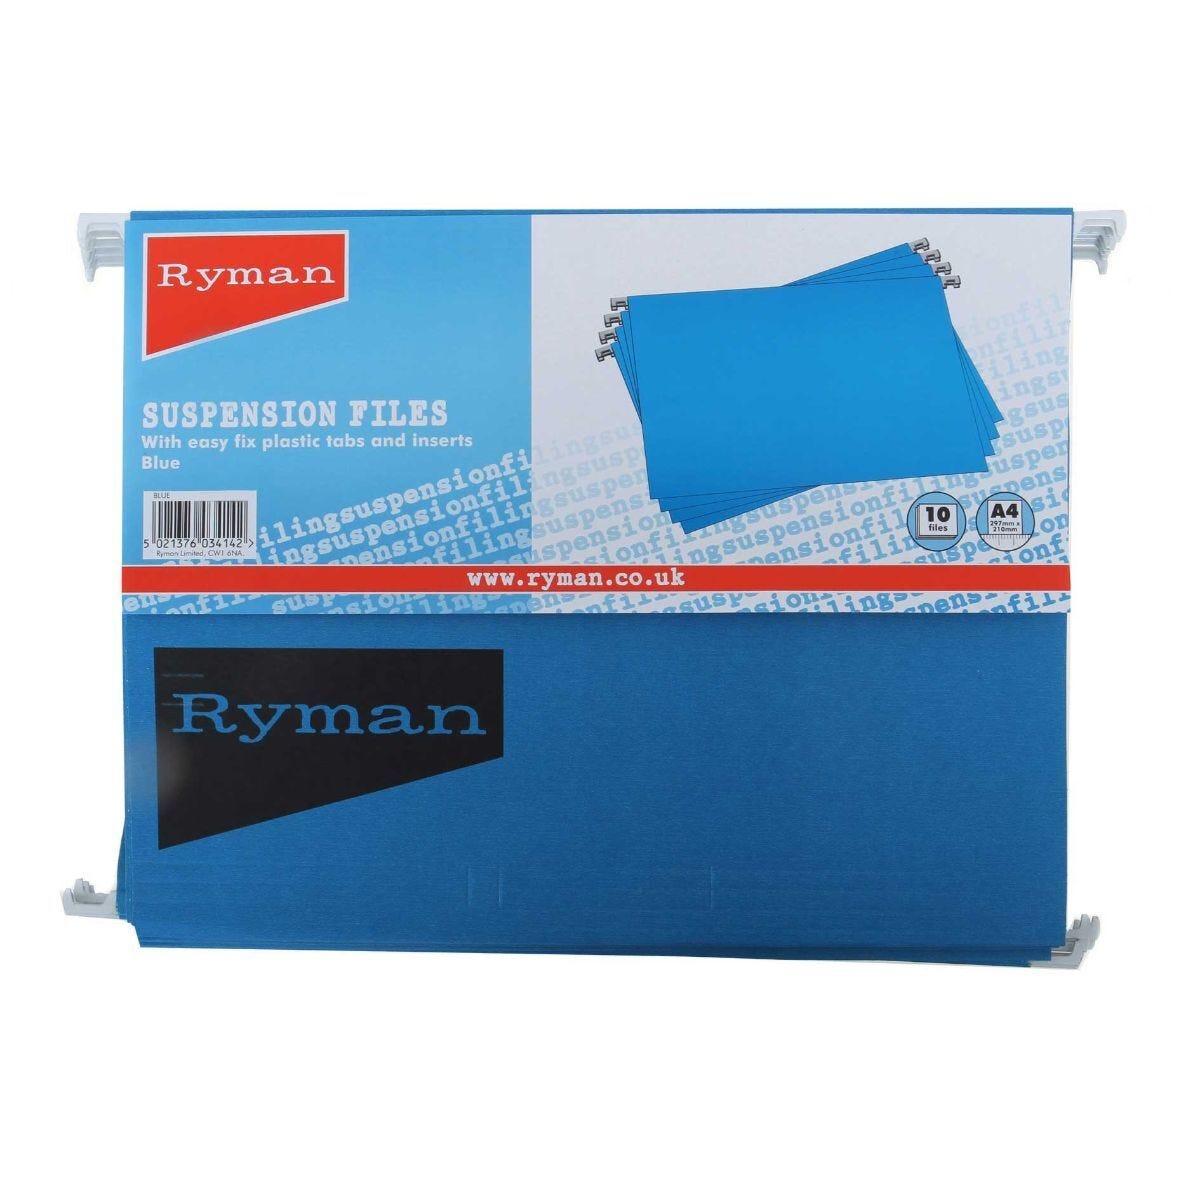 Ryman Suspension Files A4 Plastic Tab  Pack of 50